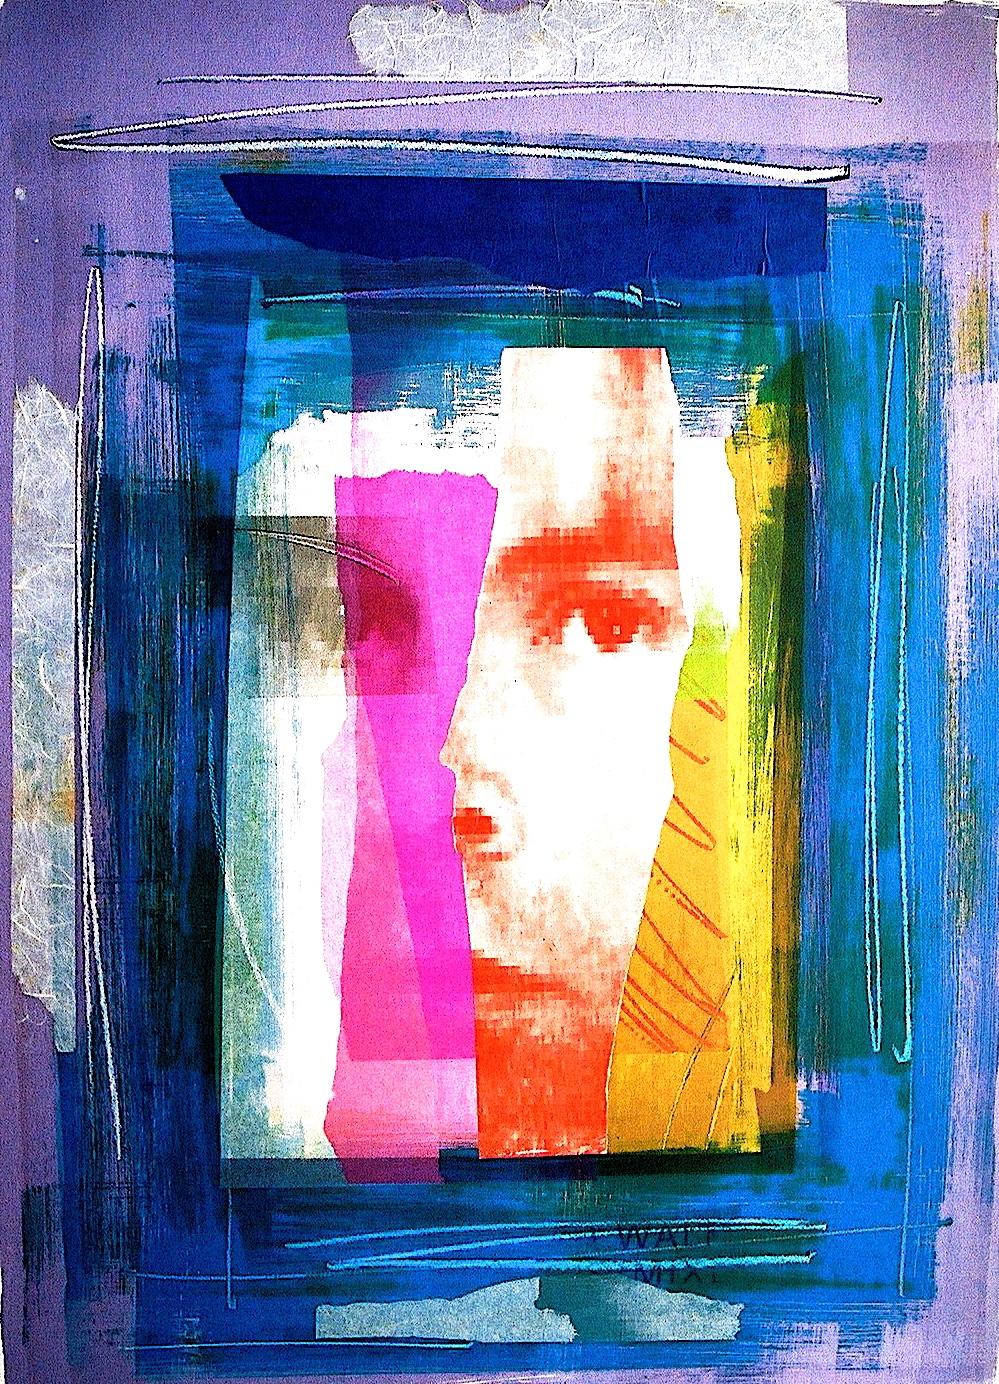 Instinctive Pink (1994)